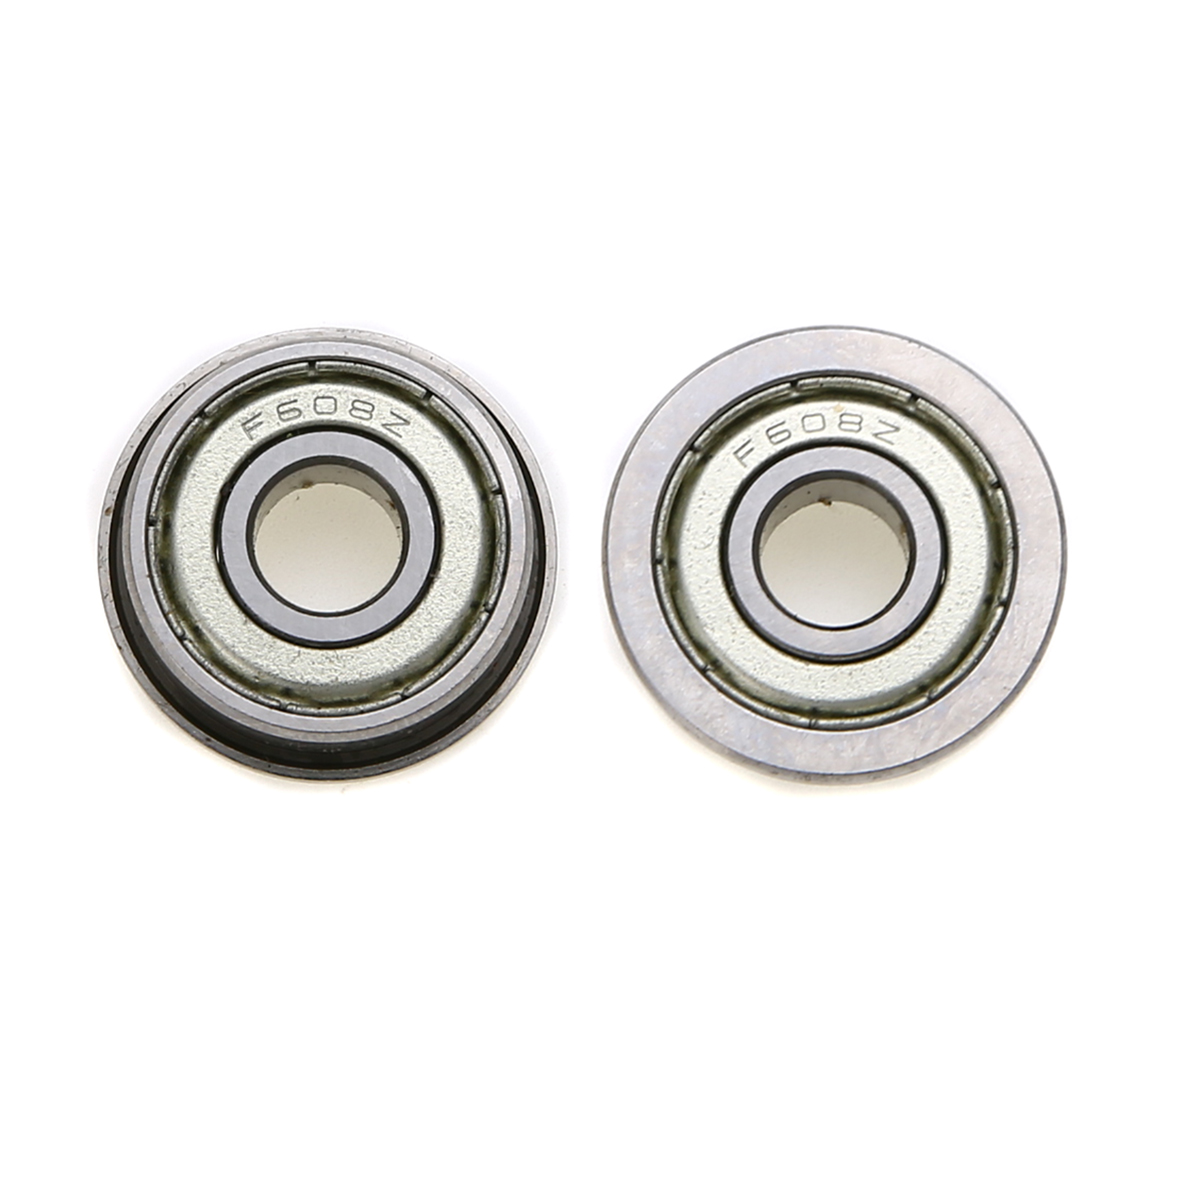 все цены на  10pcs/lot New Miniature F608ZZ Ball Bearing Mayitr Metric High Precision Metal Flanged Ball Bearings 8mm*22mm*7mm  онлайн